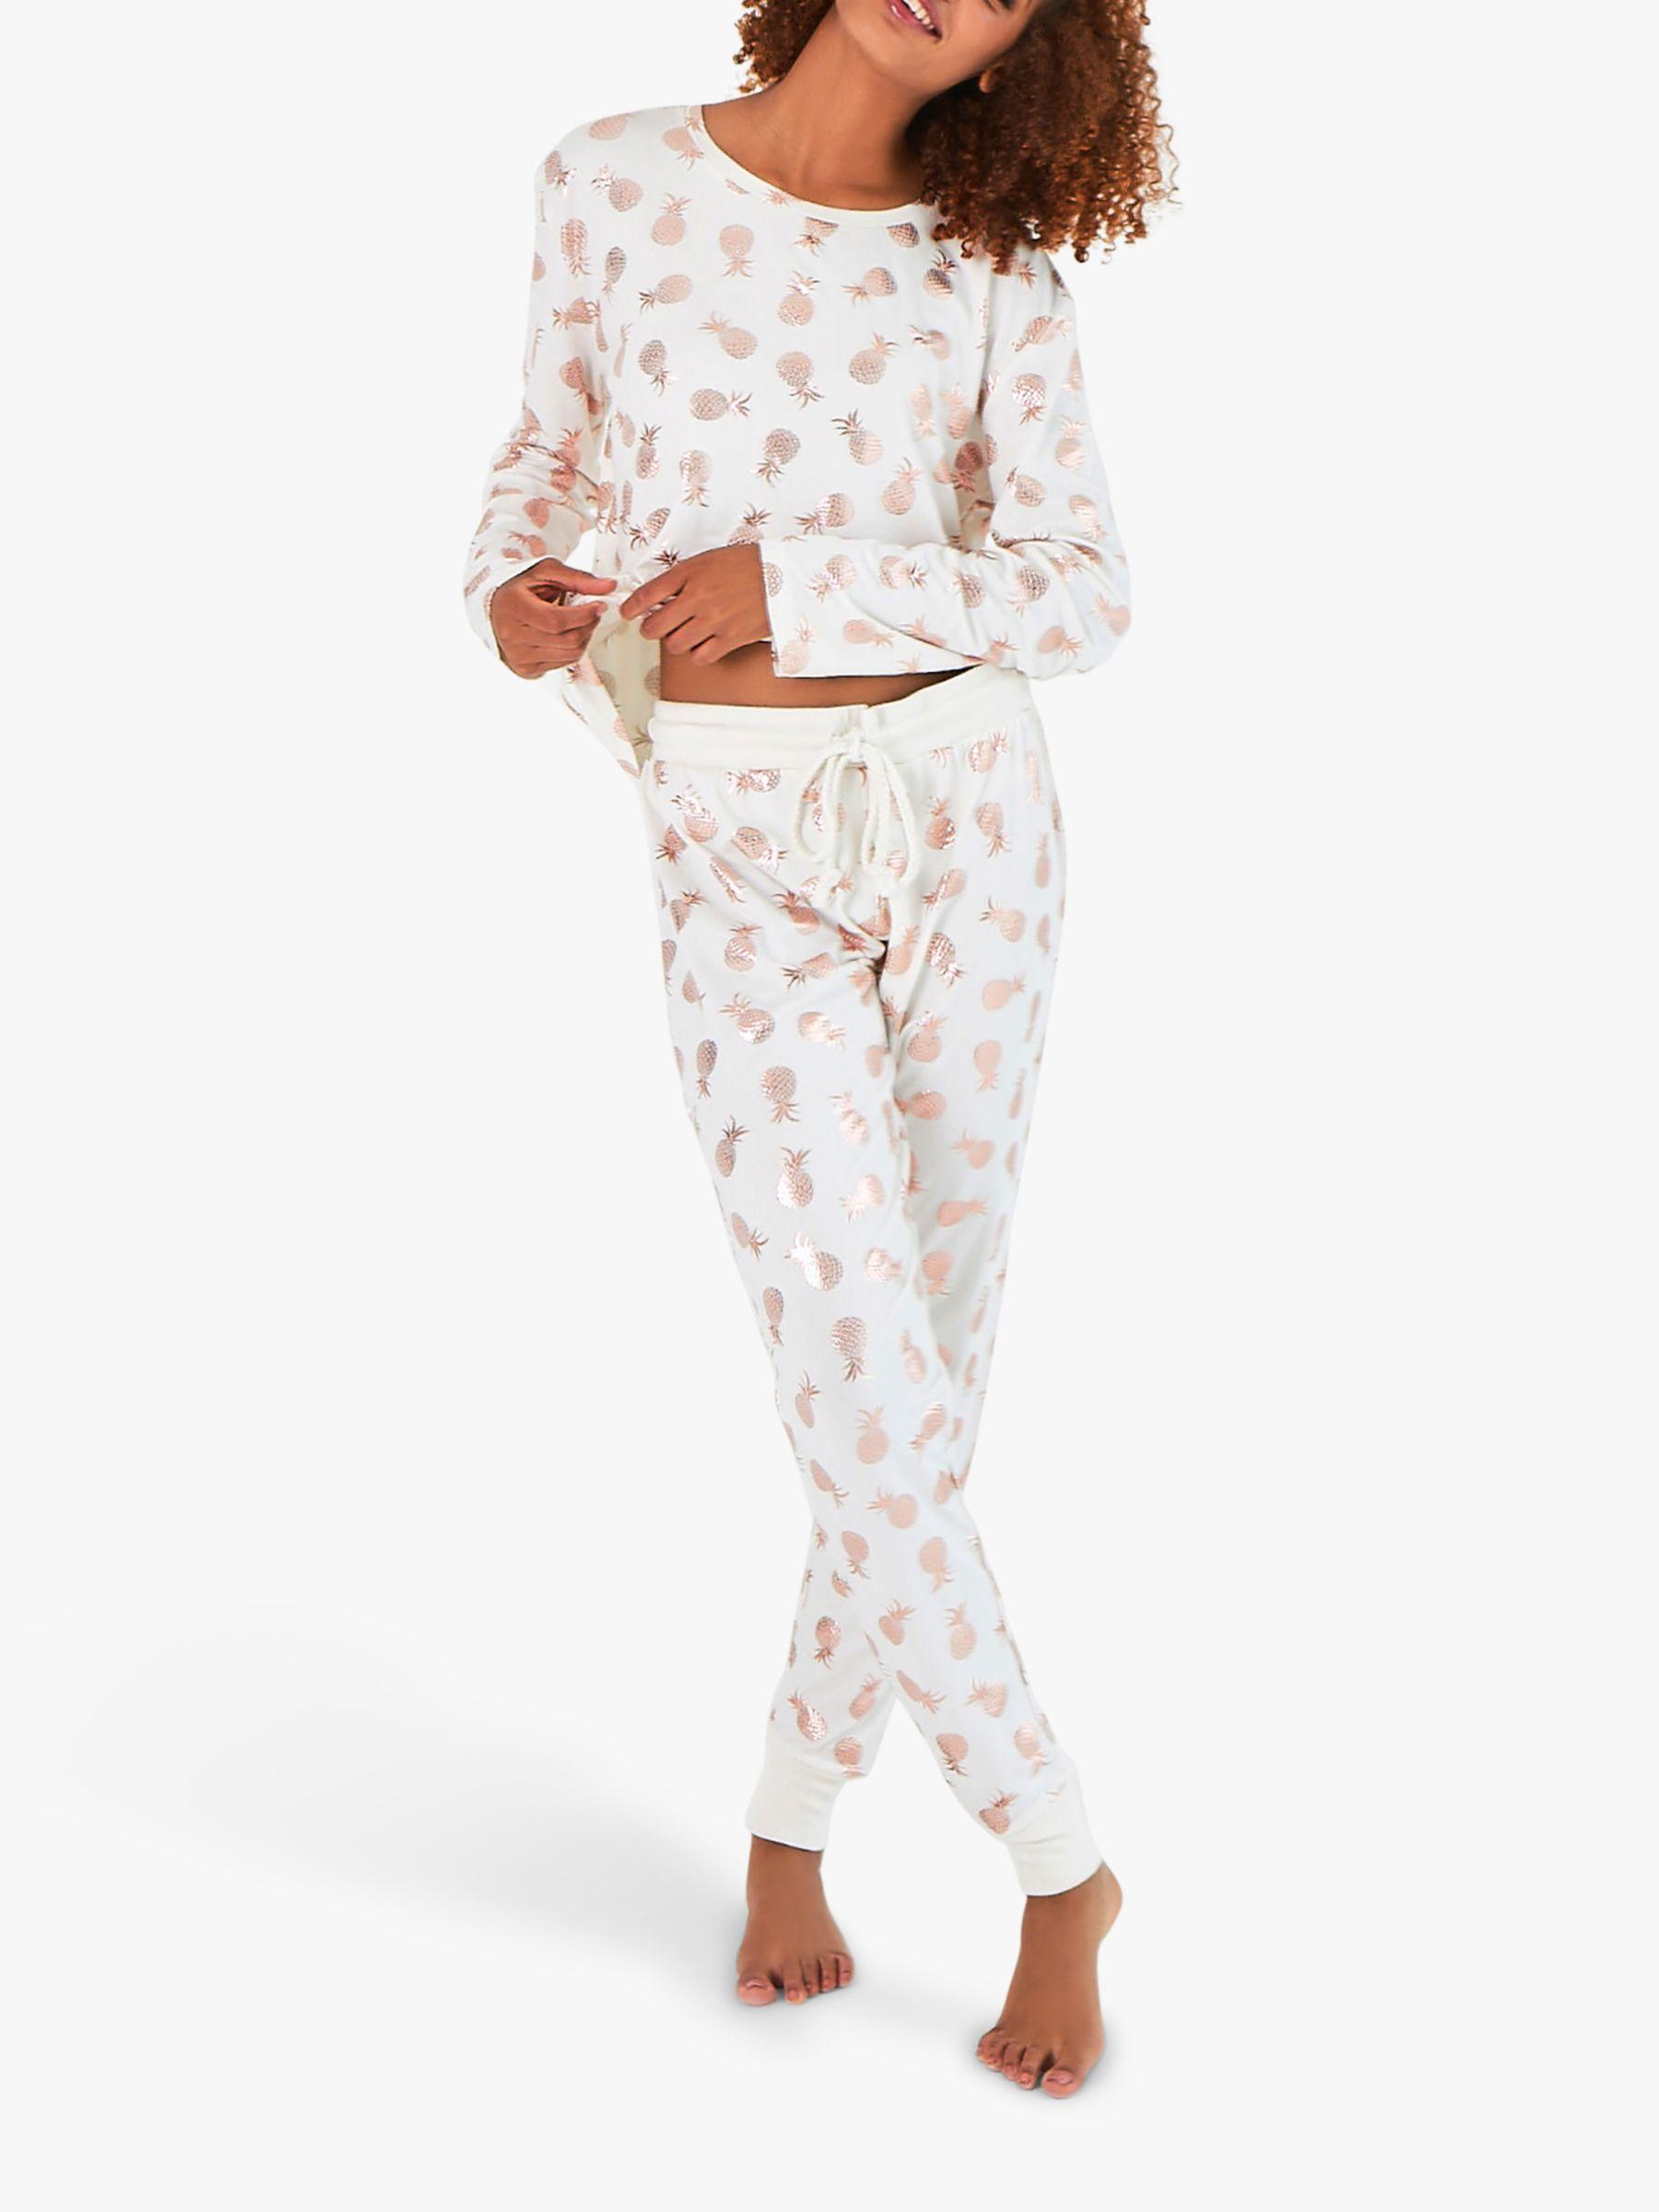 Chelsea Peers Chelsea Peers Pineapple Print Pyjama Set, Ivory/Rose Gold